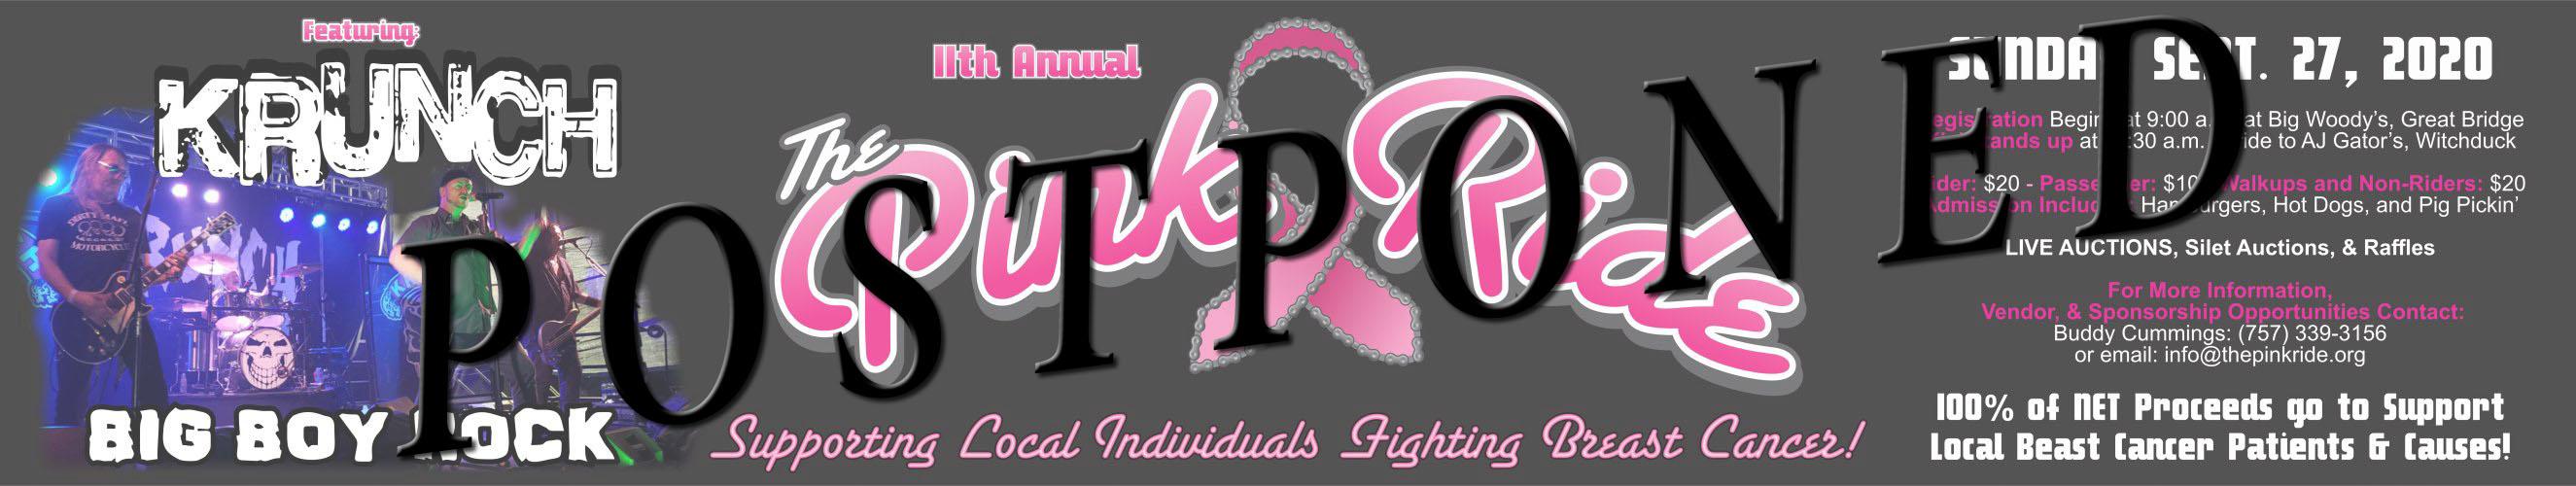 2020 PinkRide Banner